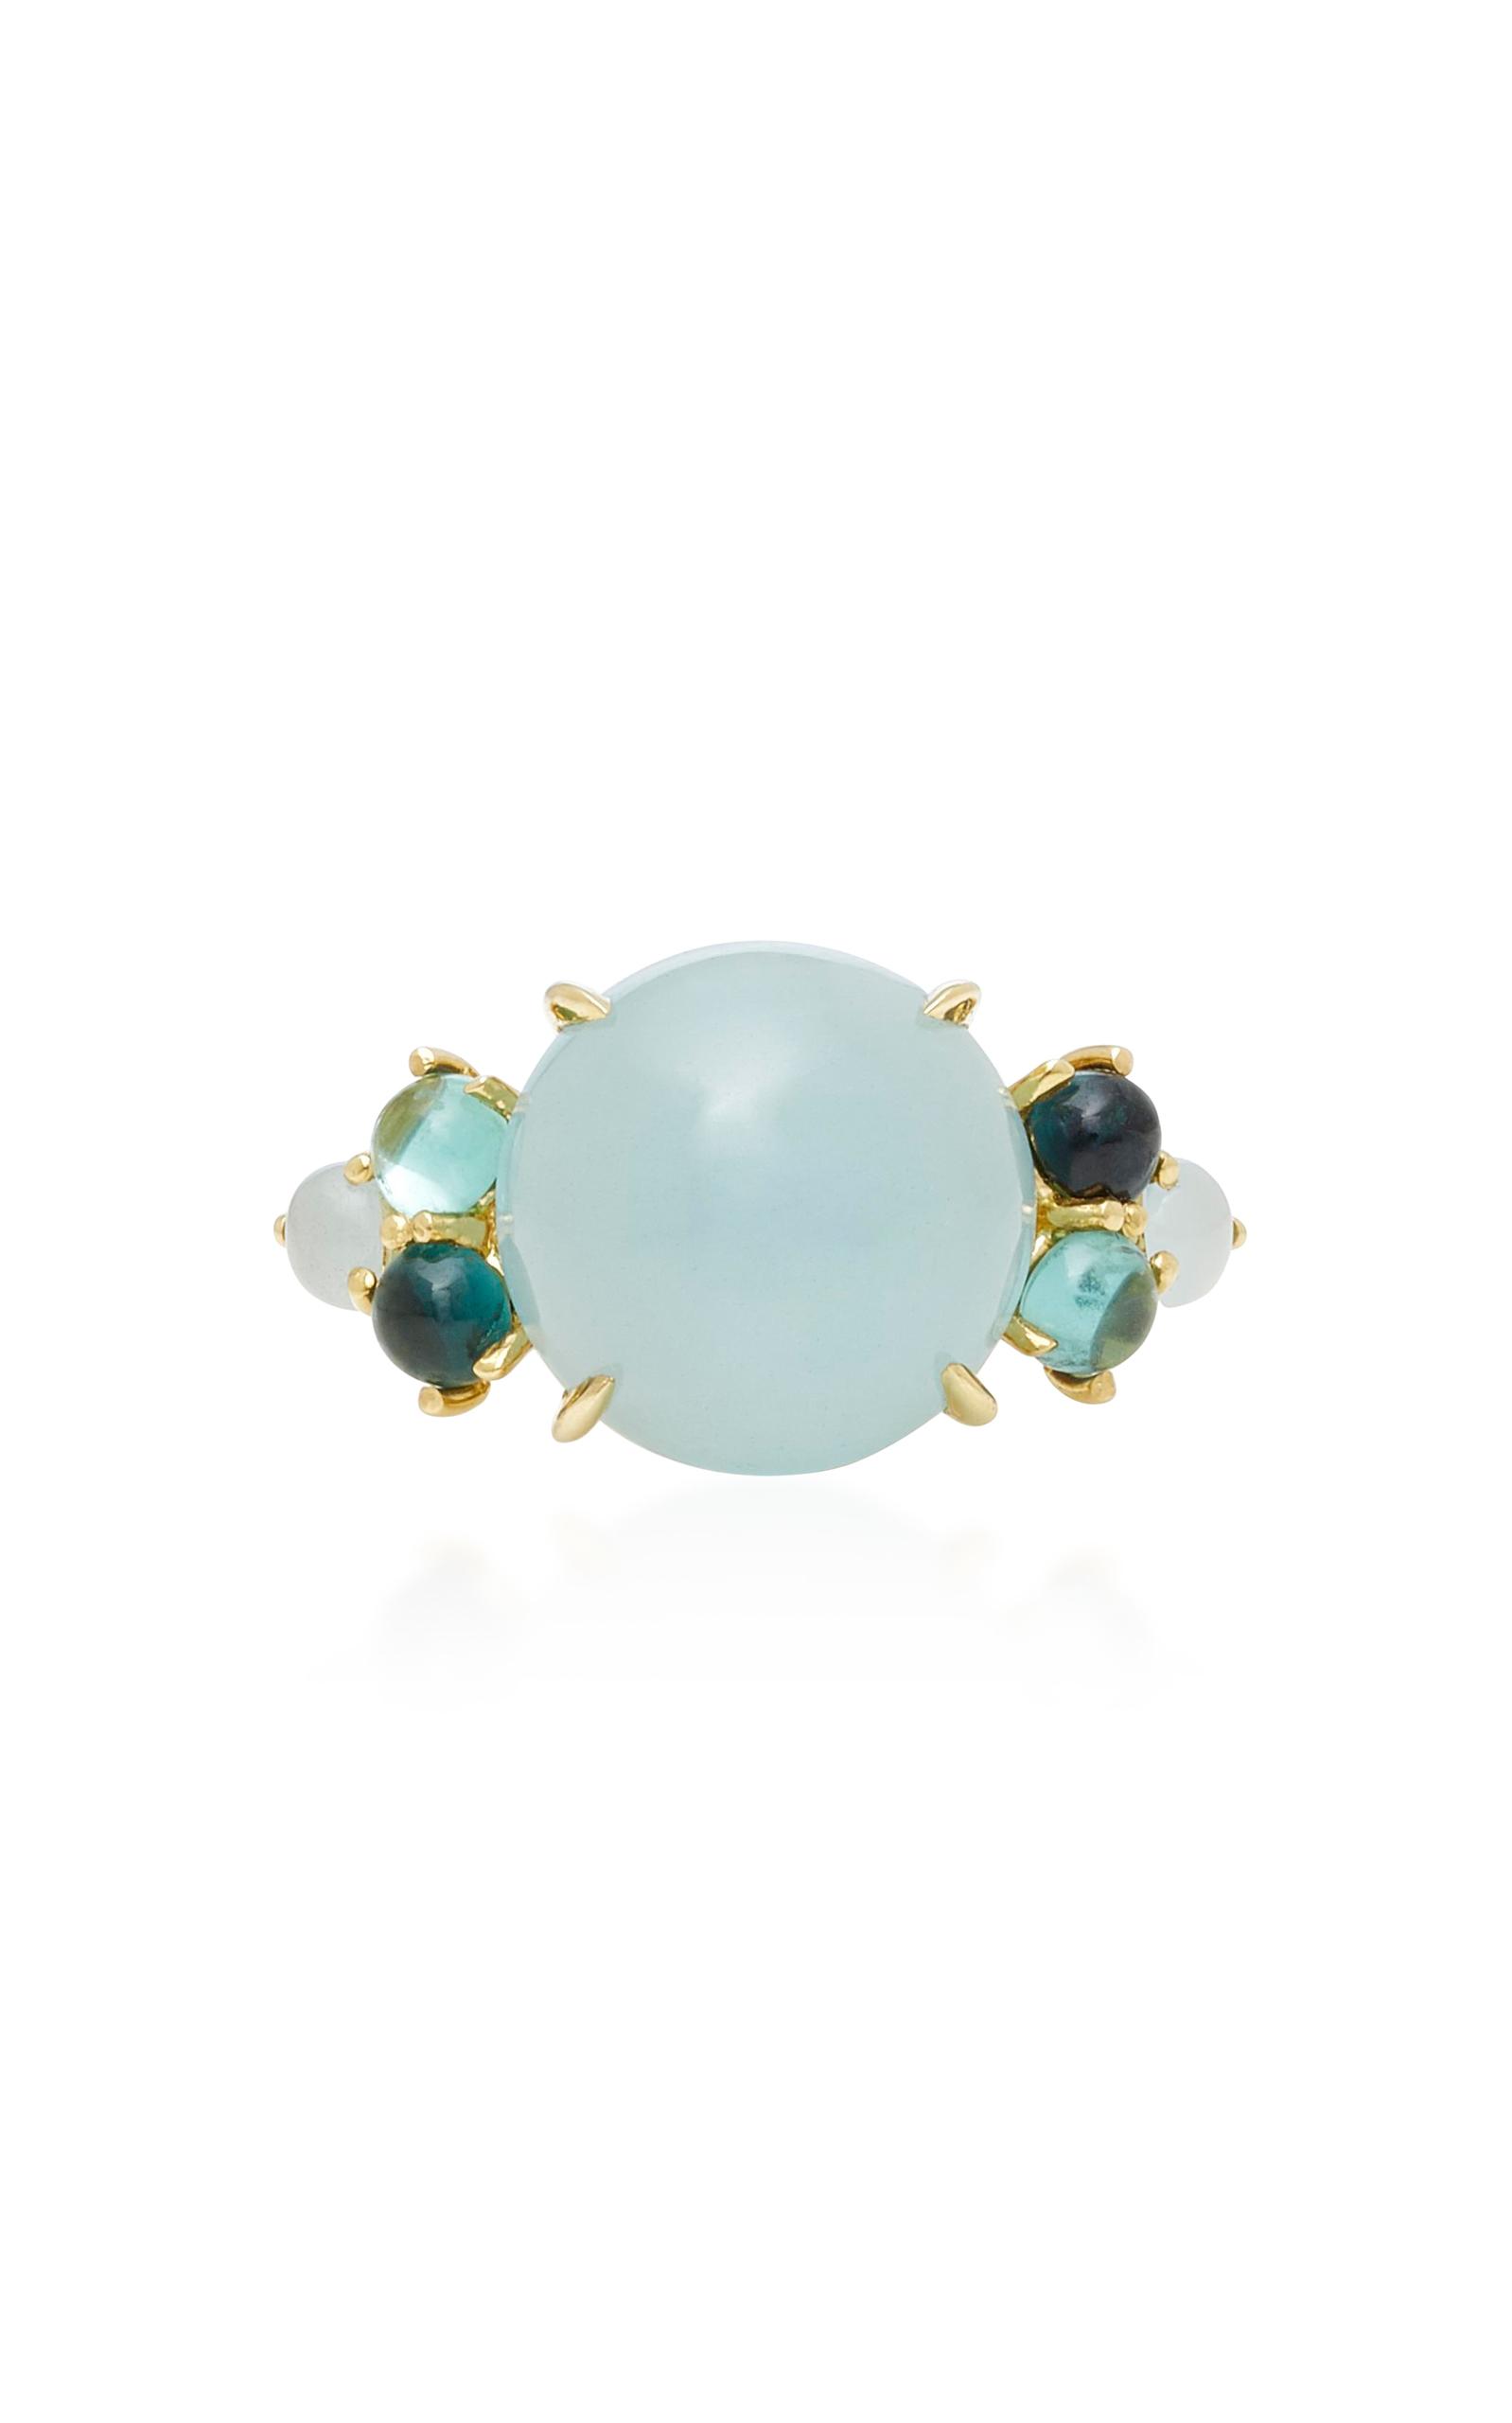 DARIA DE KONING Dagny 18K Yellow Gold Multi-Stone Grande Ring in Blue